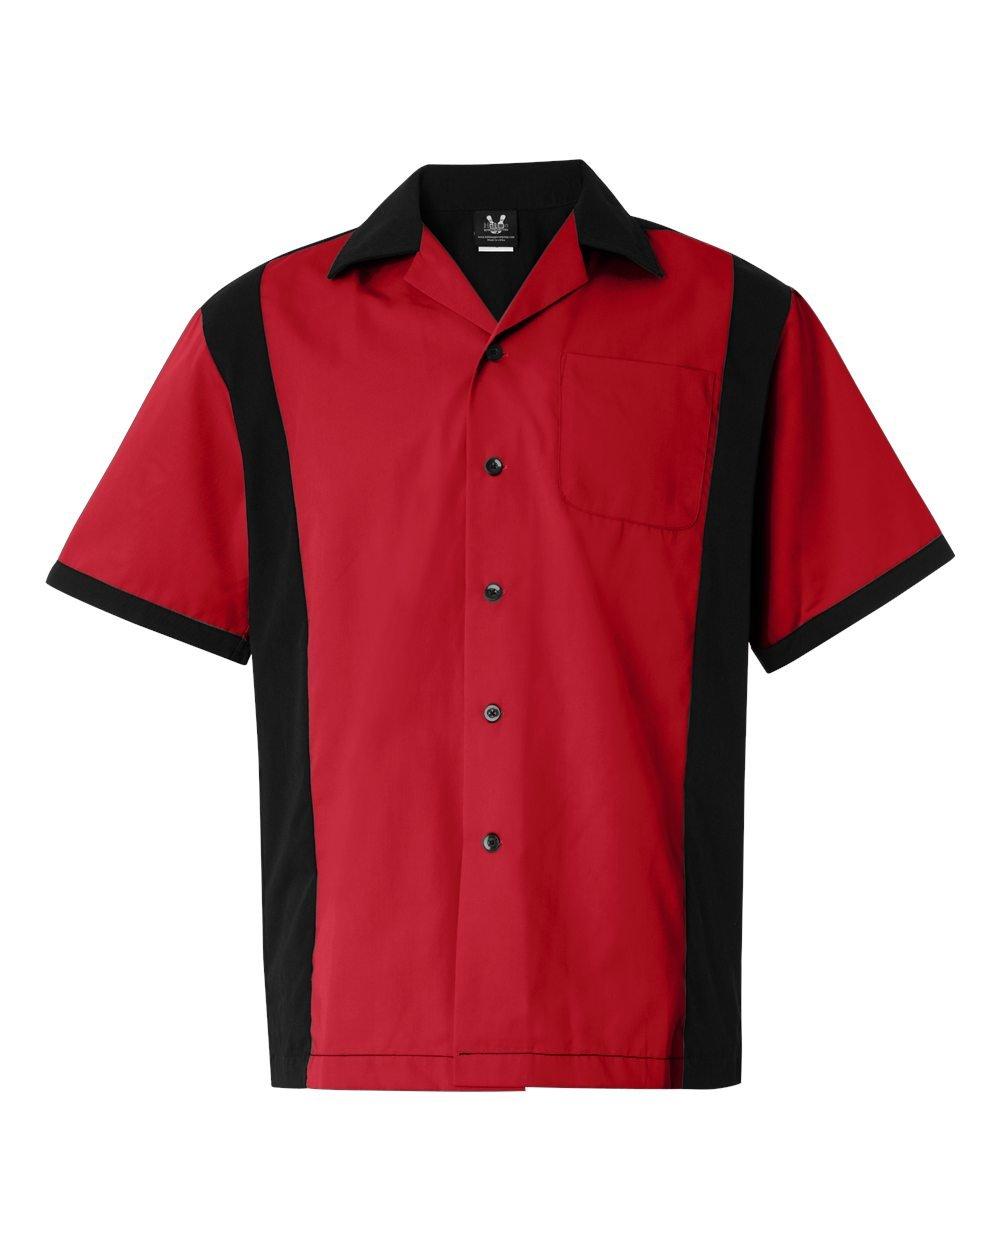 Hilton HP2243 Men's Cruiser Bowling Shirt Red Small